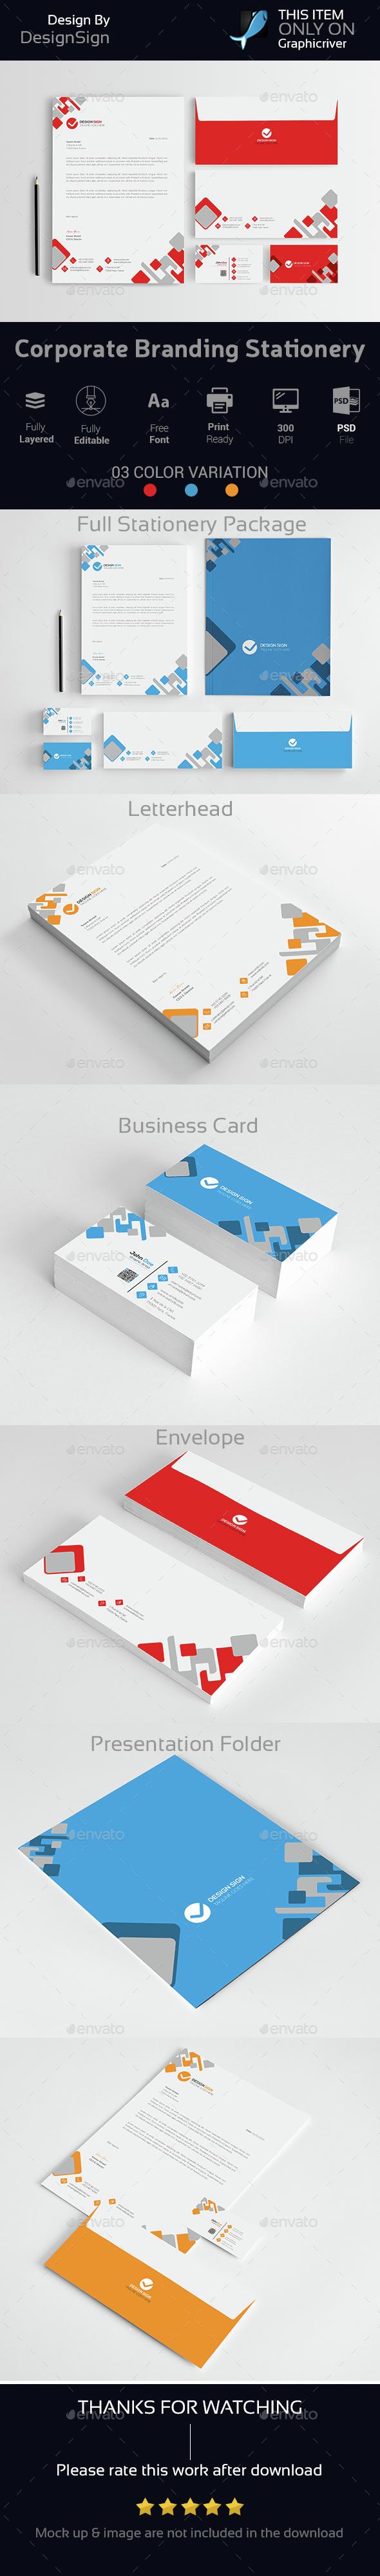 Corporate Branding Stationery Vol-03 - Stationery Print Templates